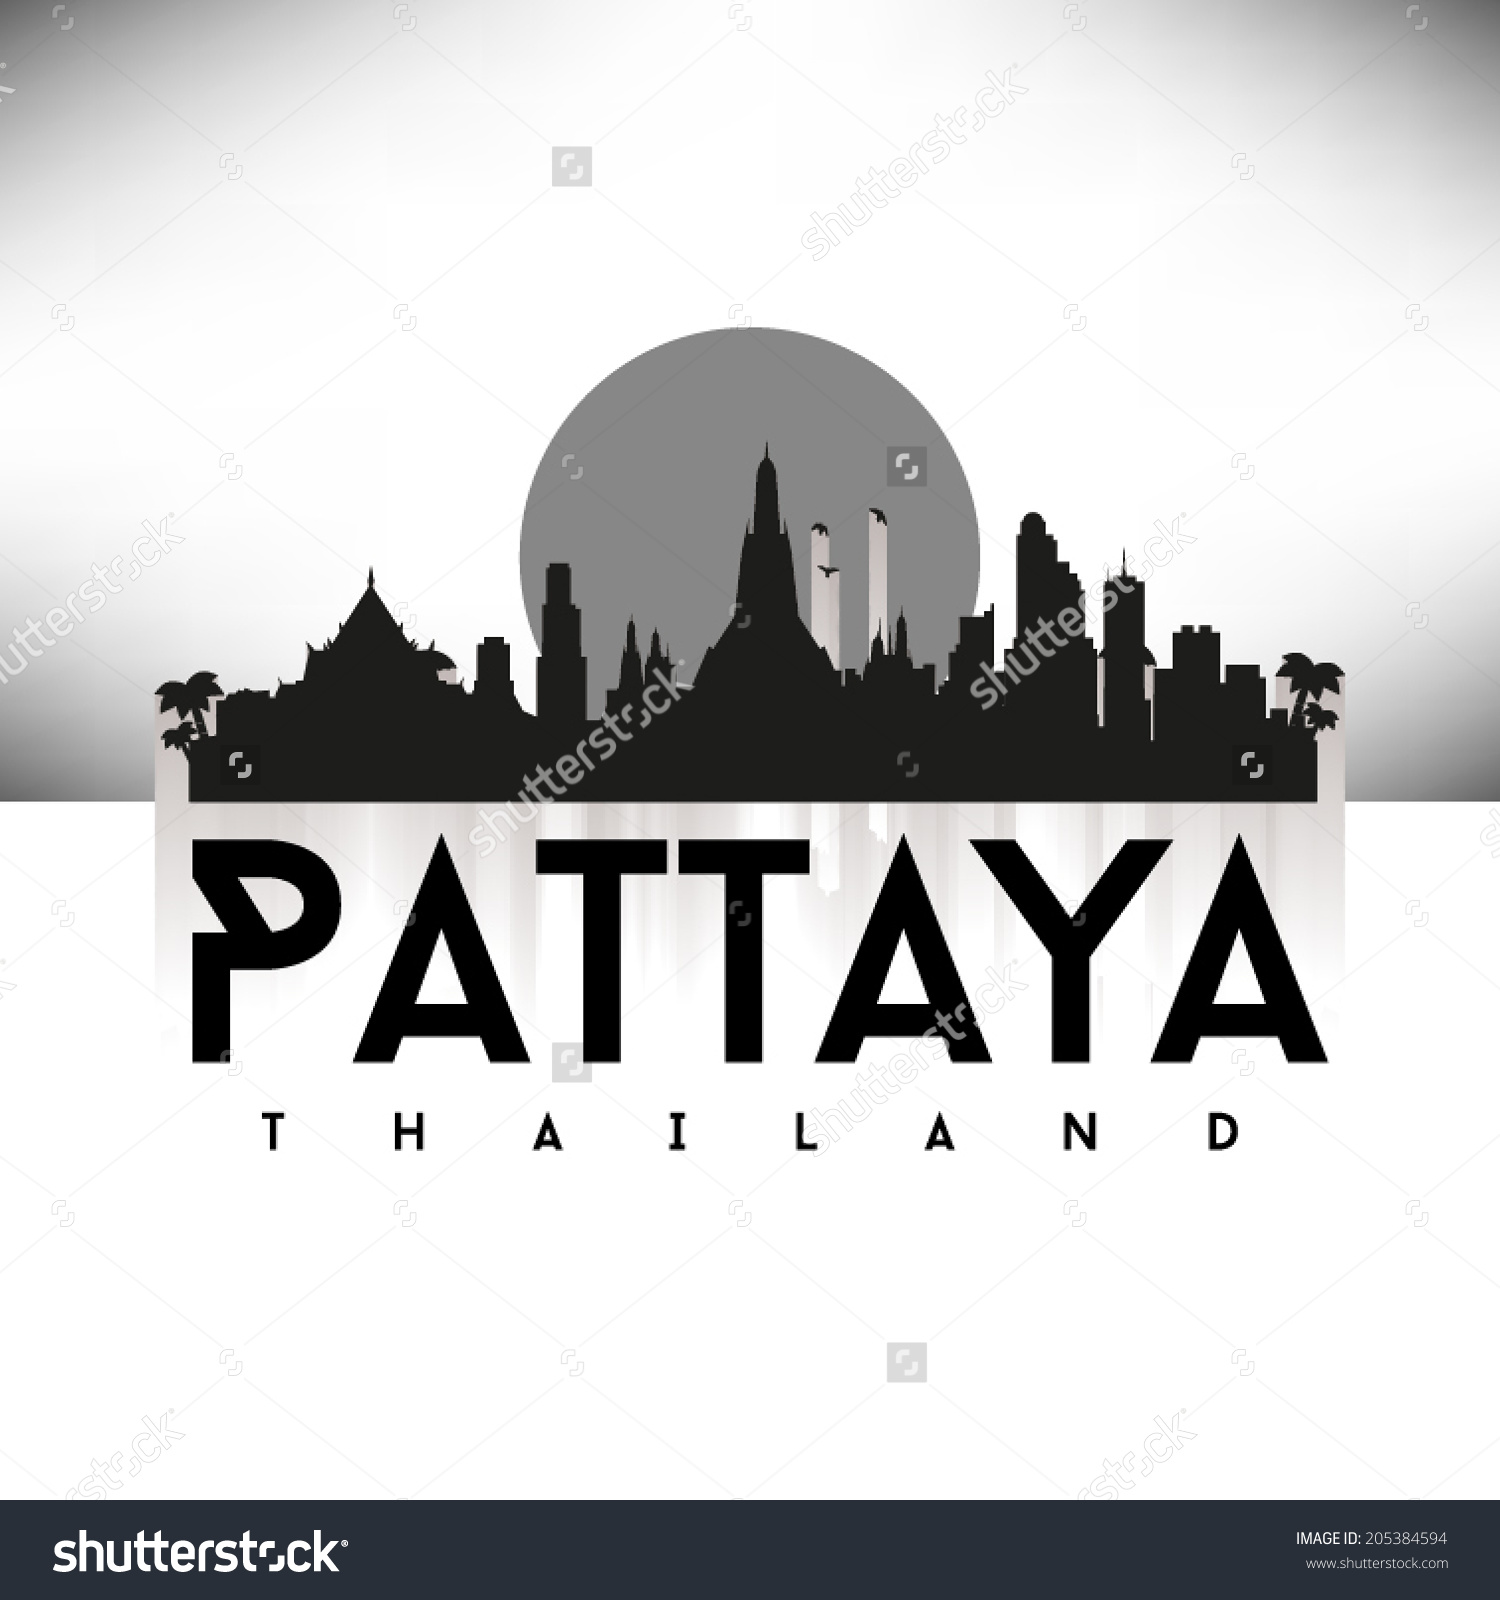 Pattaya Thailand Black Skyline Design Vector Stock Vector.